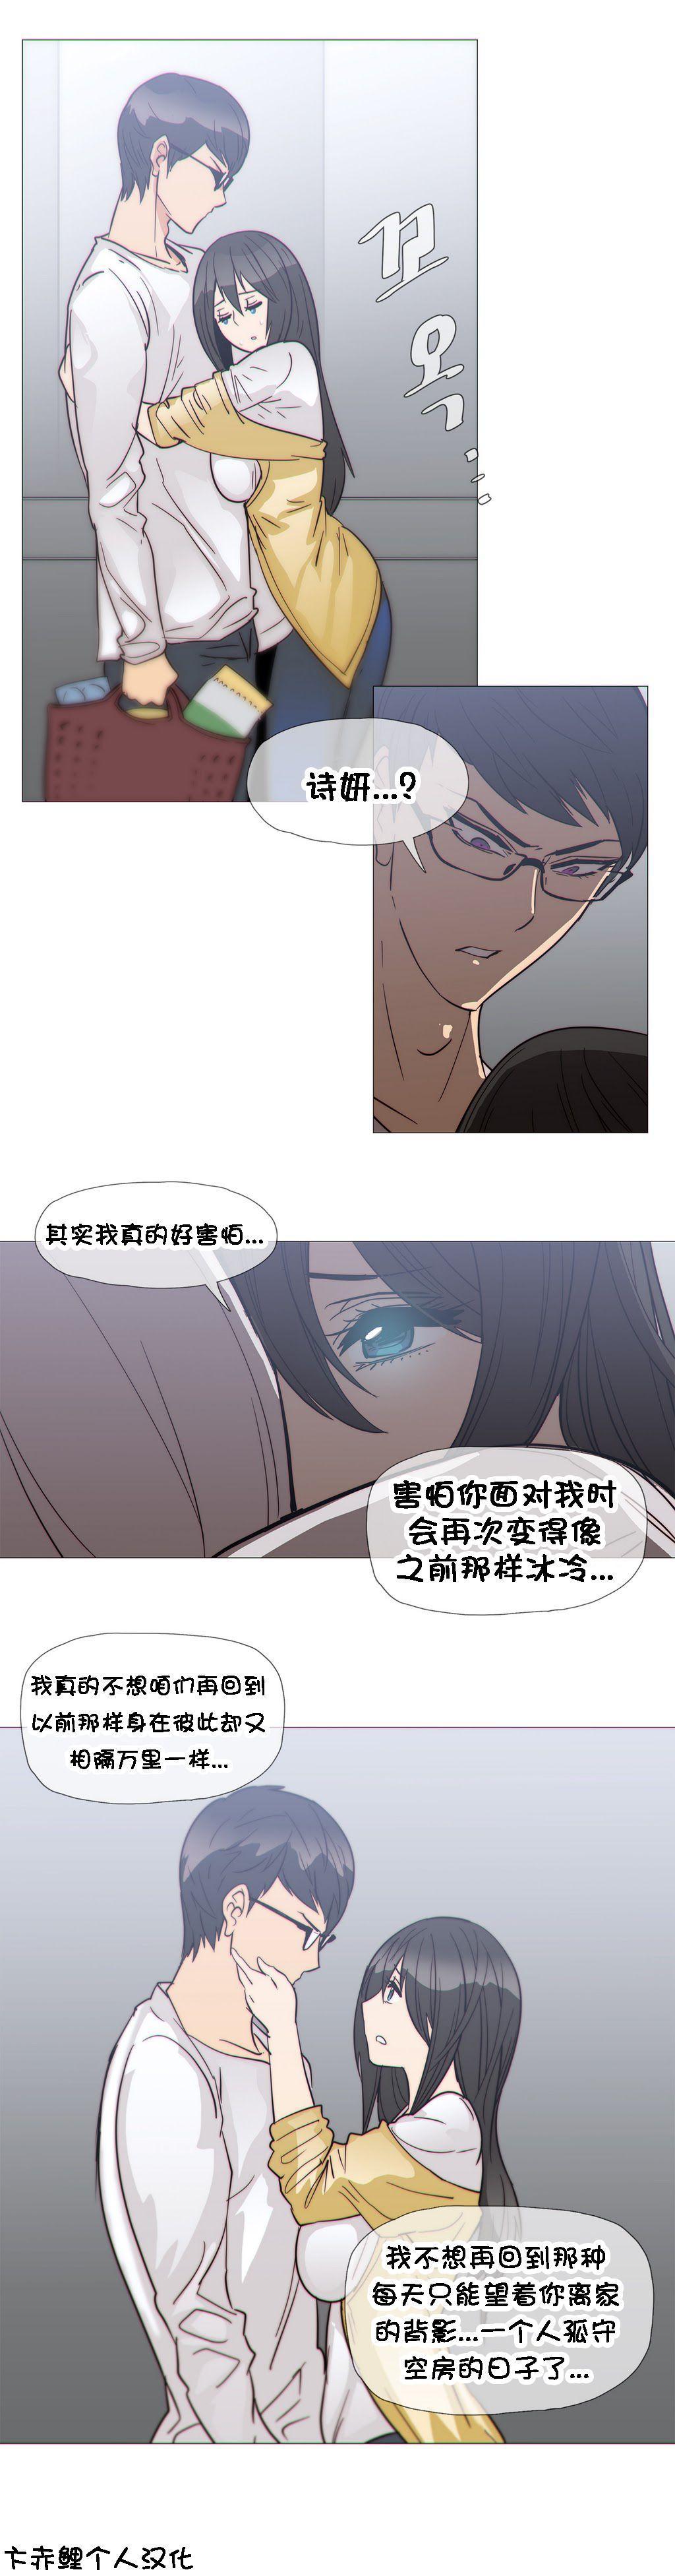 HouseHold Affairs 【卞赤鲤个人汉化】1~33话(持续更新中) 588